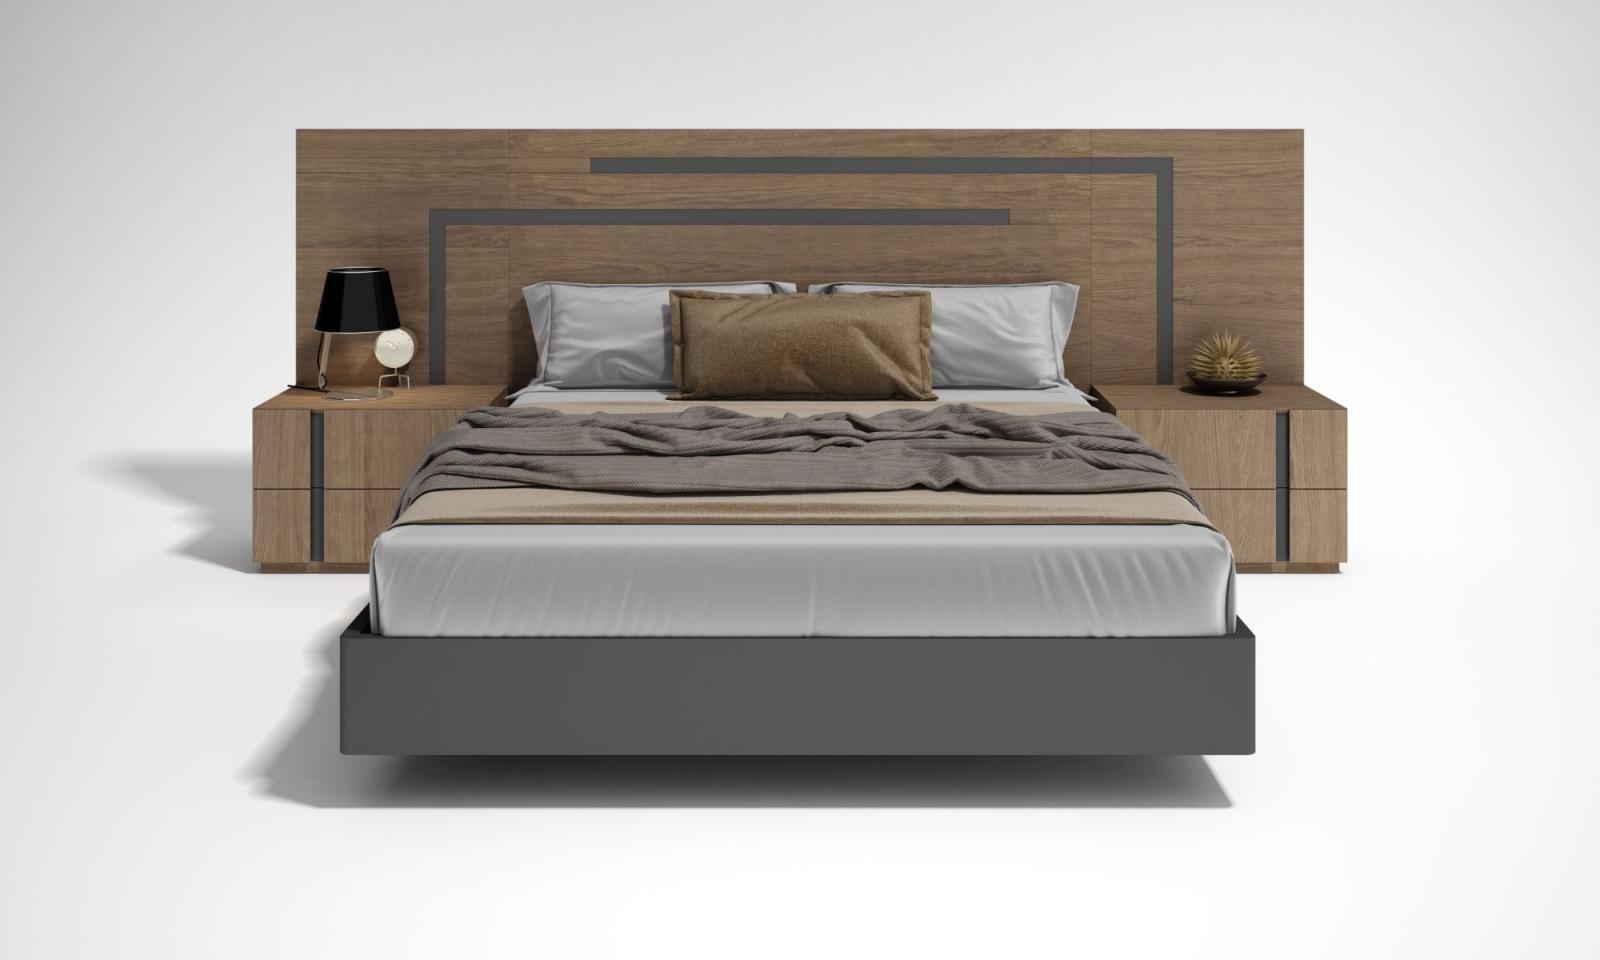 Conjunto de Dormitorio SUNSET-1 - Conjunto de Dormitorio SUNSET-1